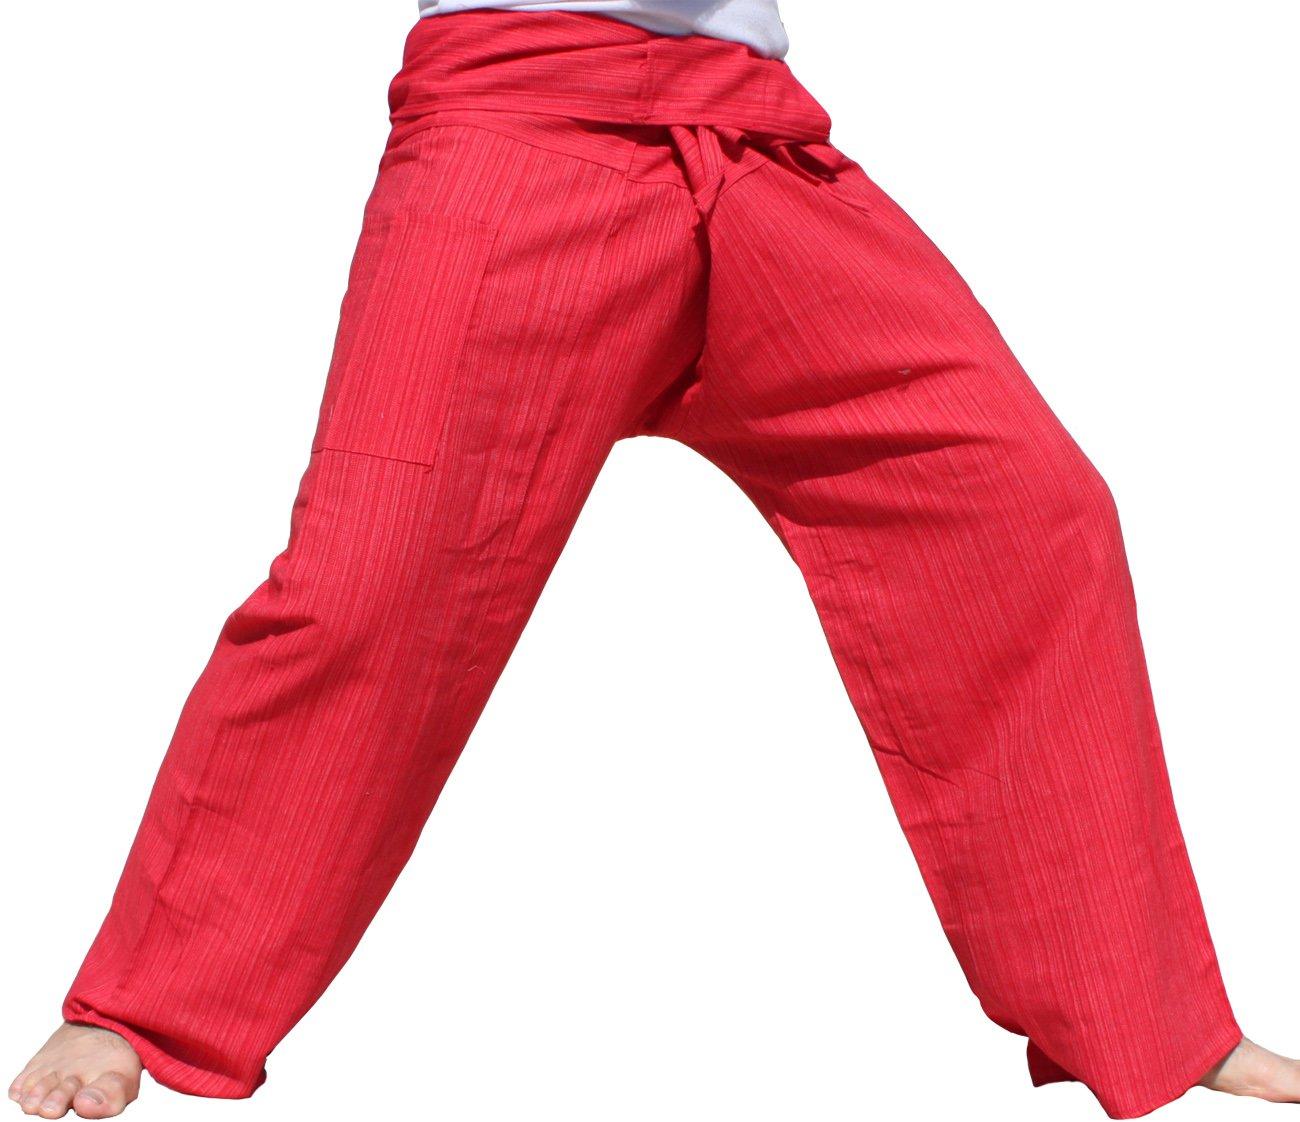 RaanPahMuang Light Striped Cotton Tall Thai Fisherman Wrap Pants Plus, XX-Large, Light Red by RaanPahMuang